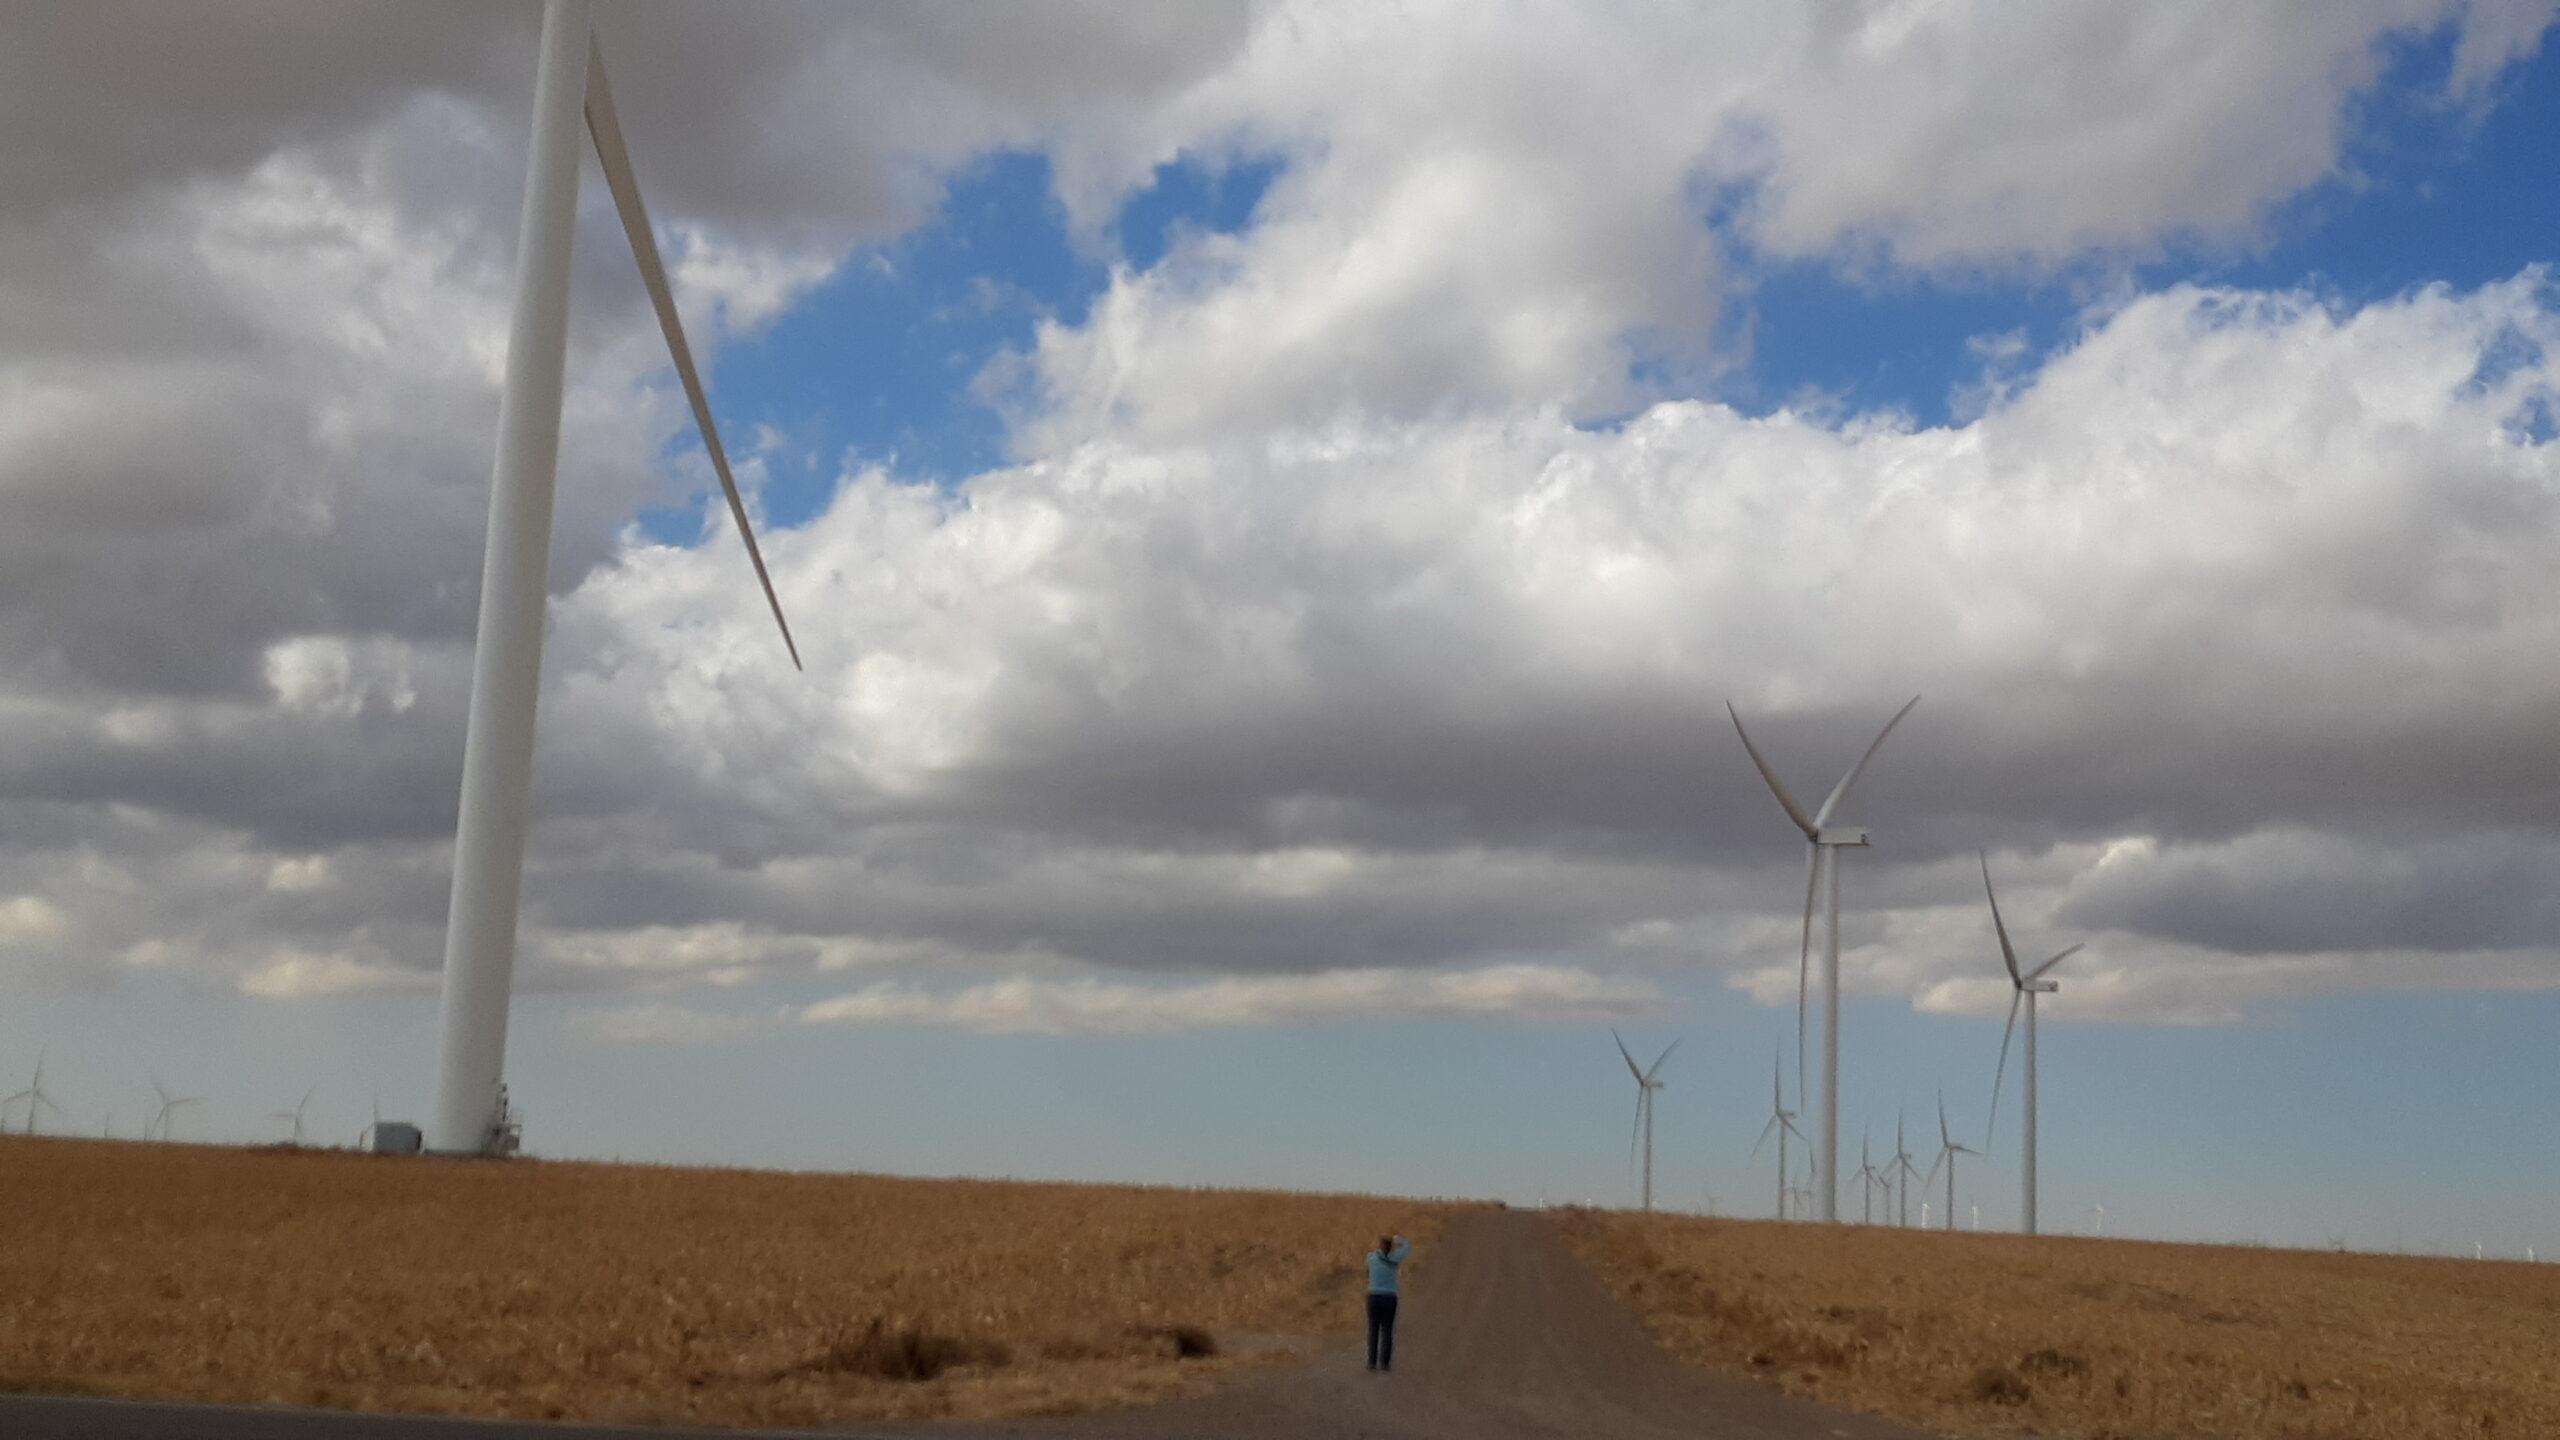 Wind energy advocates argue Senate bill pulls plug on growth in $14B industry in Kansas